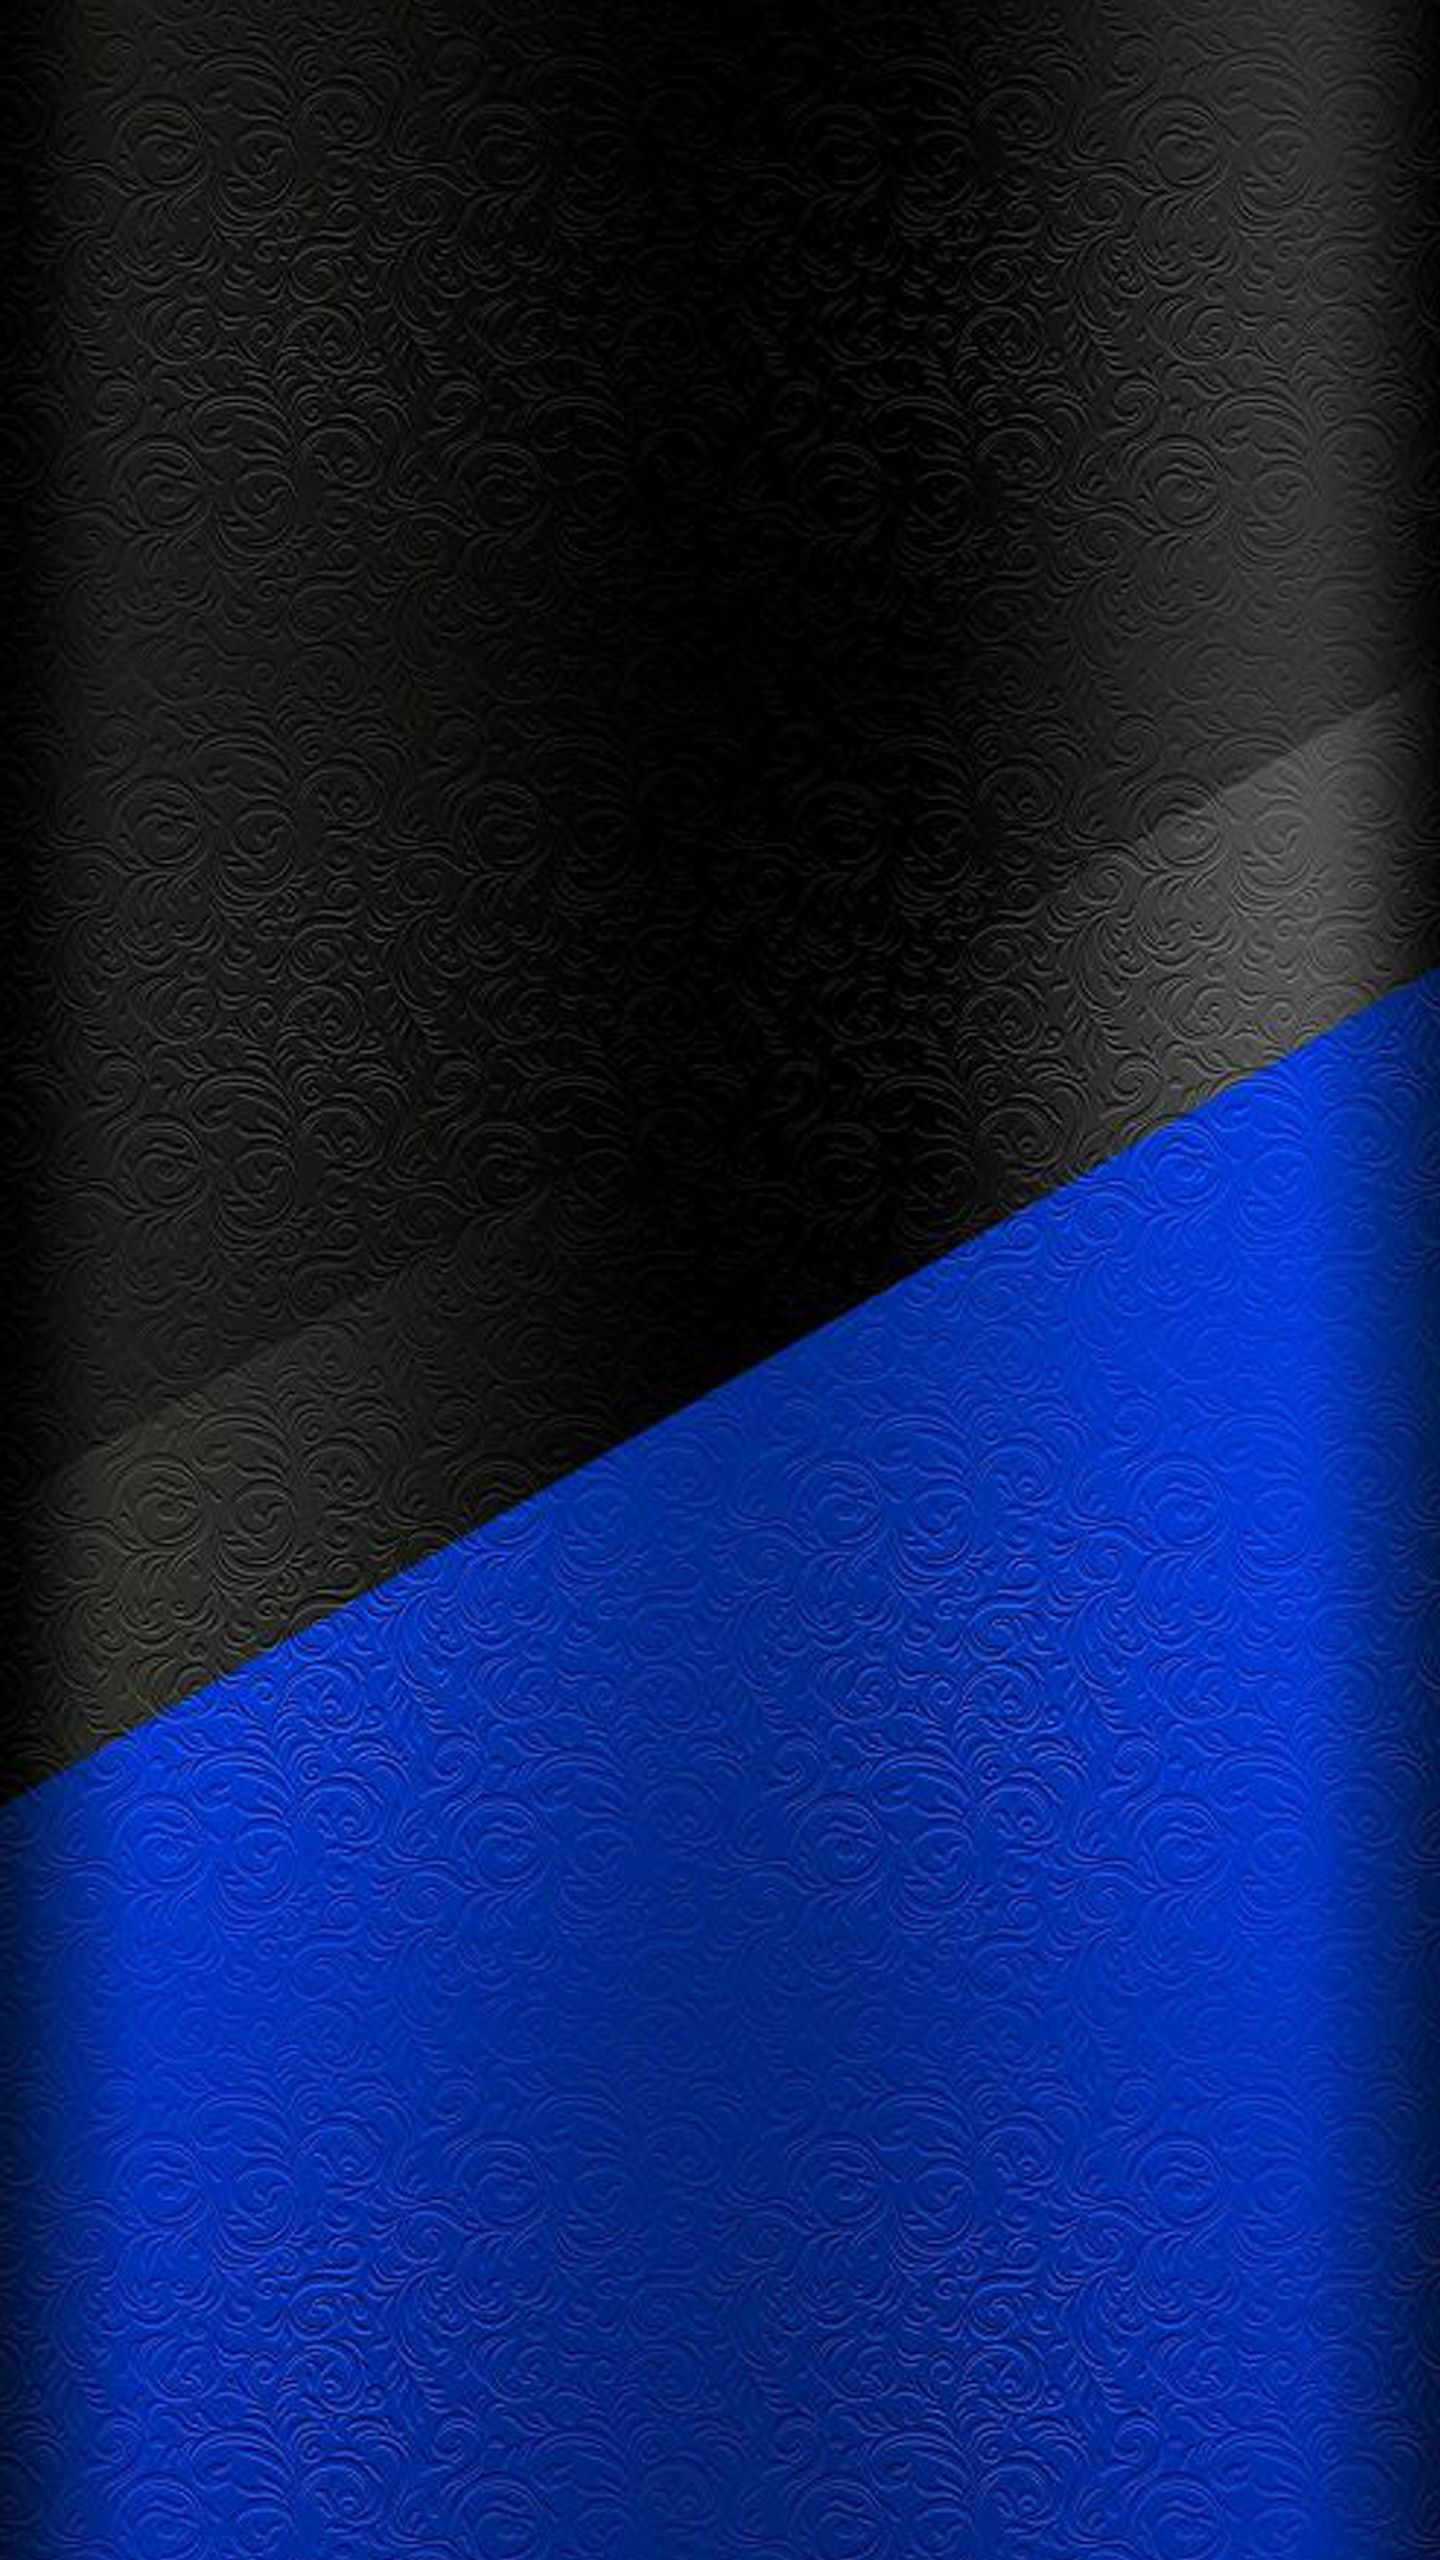 Wallpaper For Samsung Galaxy Cellphone Wallpaper Blue Colors Wallpaper Downloads Wallpaper Backgrounds